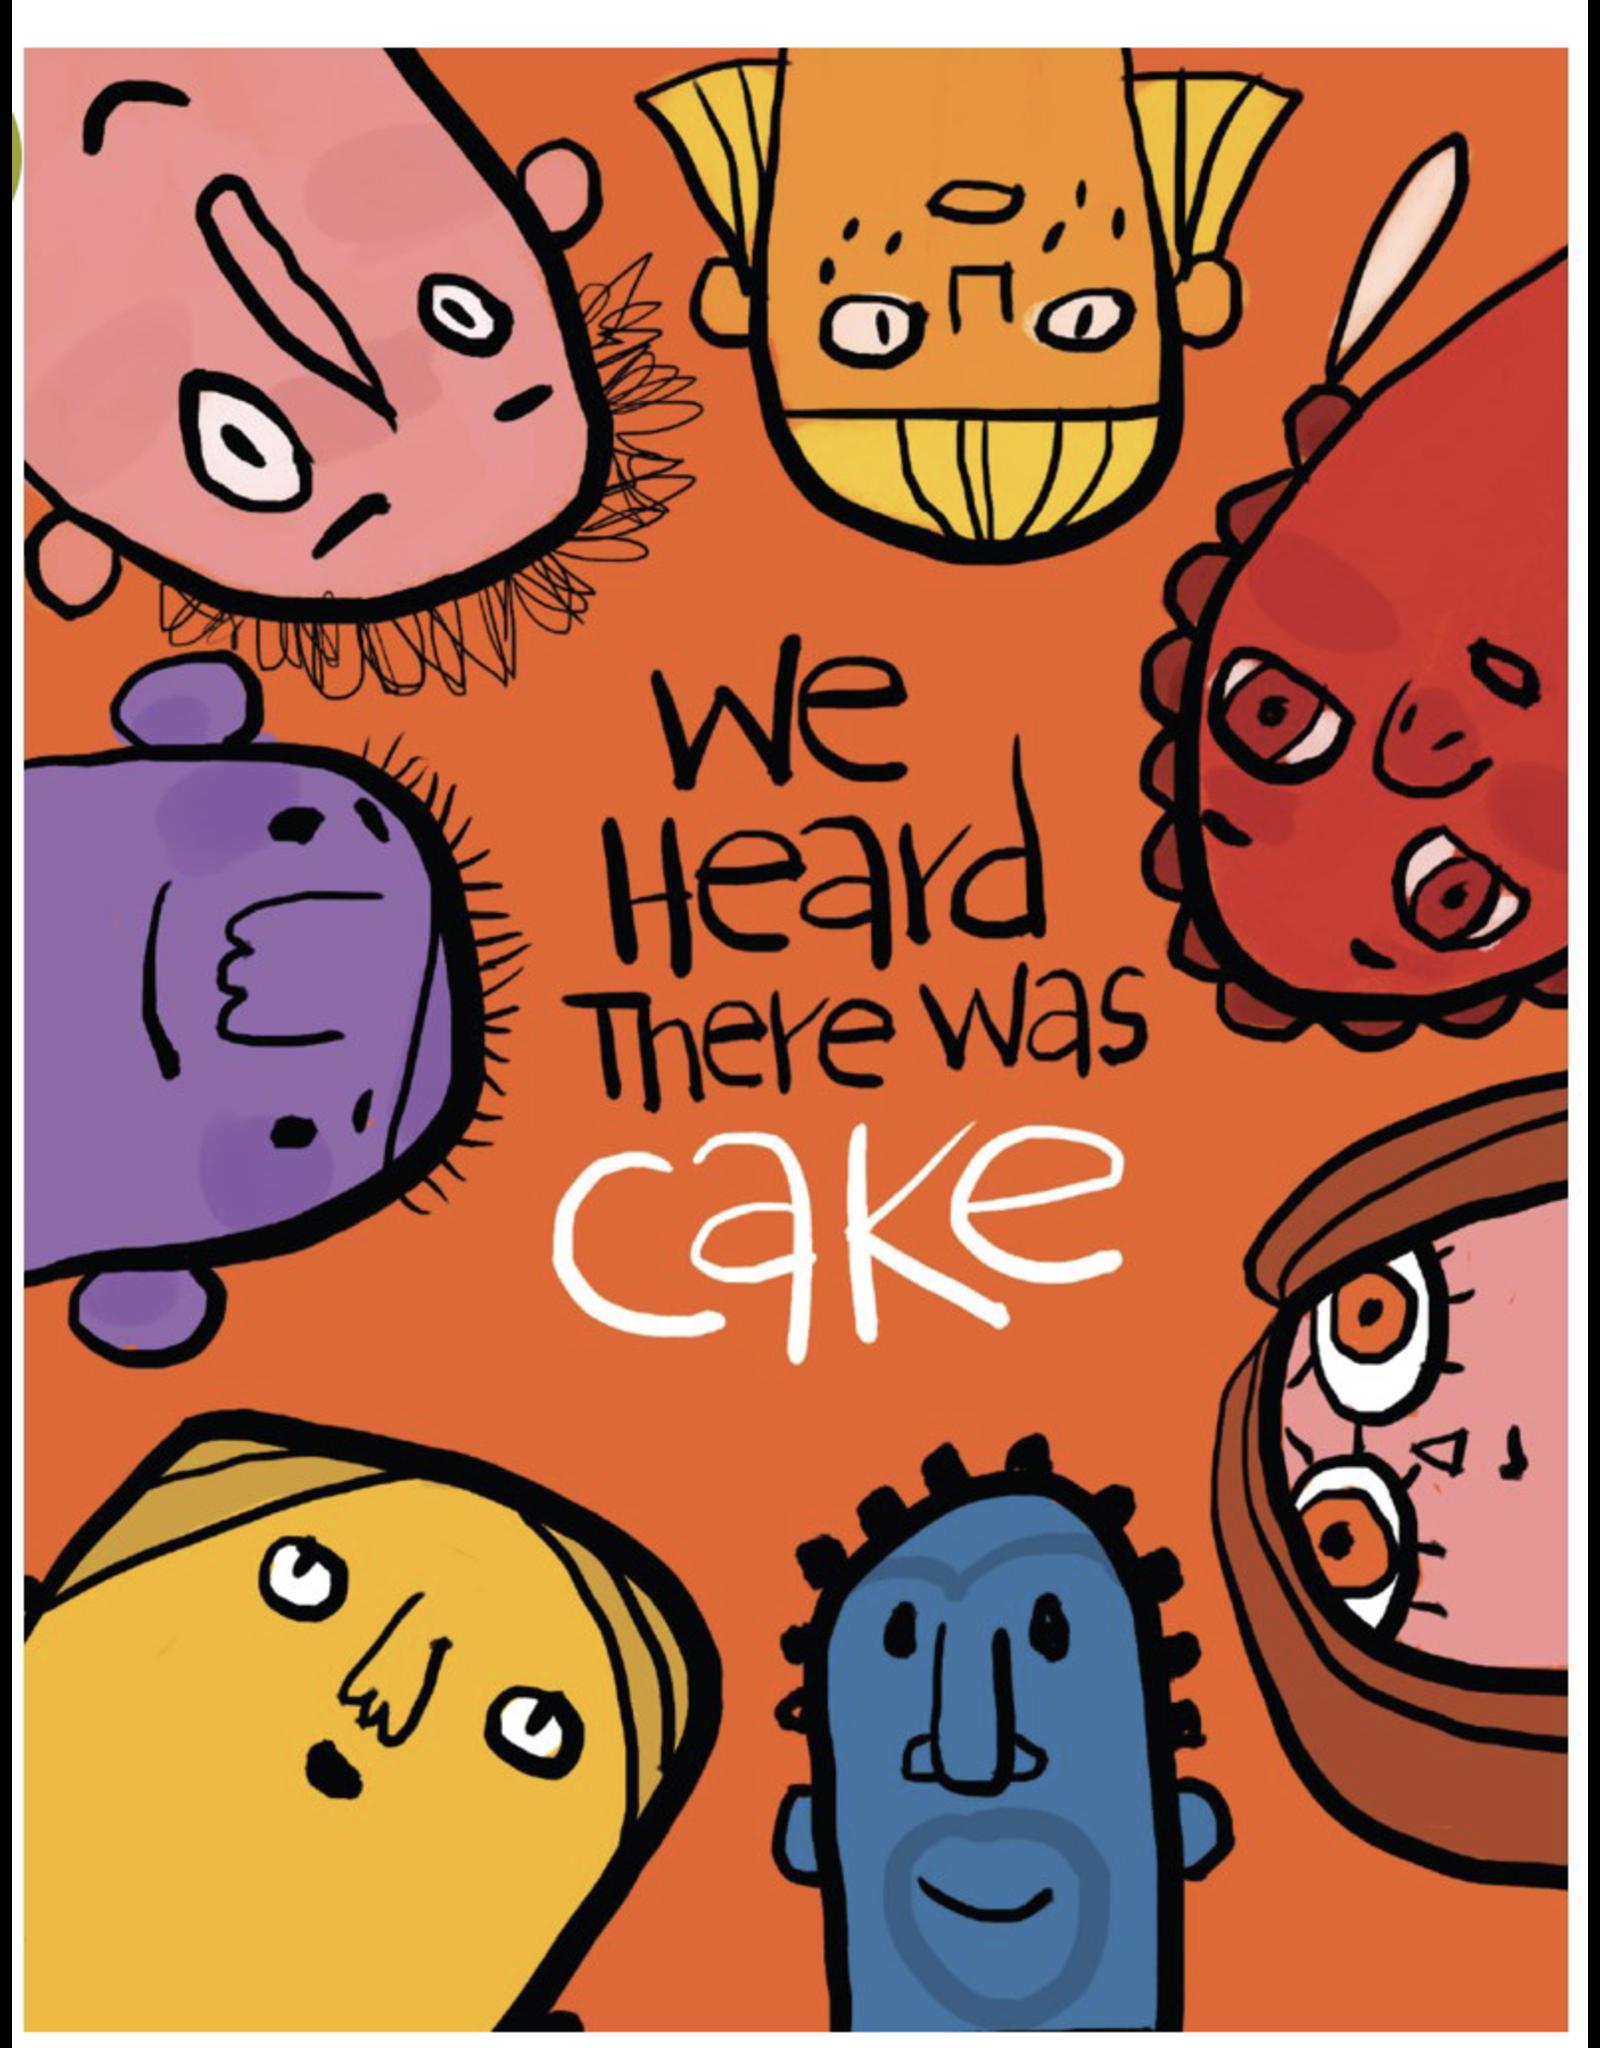 Birthday - Heard there was Cake